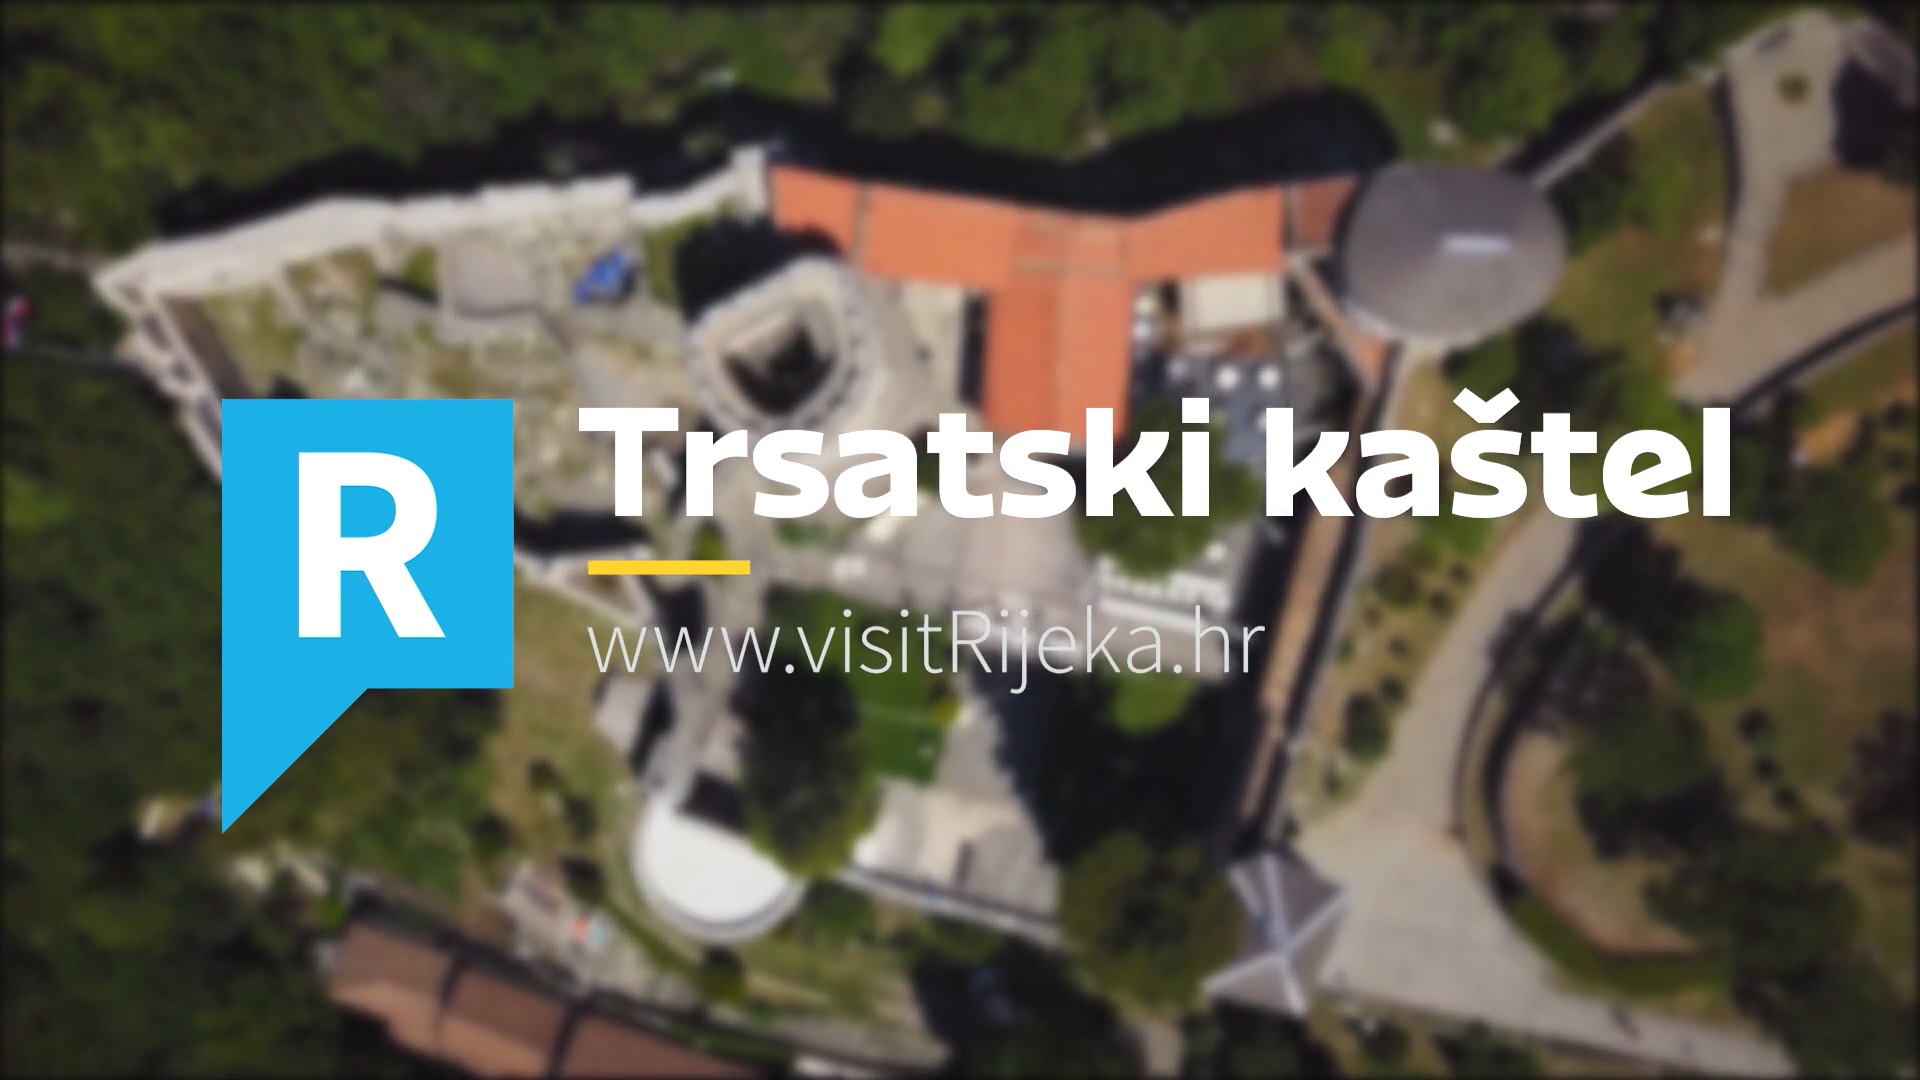 TZ Grada Rijeke Objavila Je Novi Filmić O Najšoj Gradini